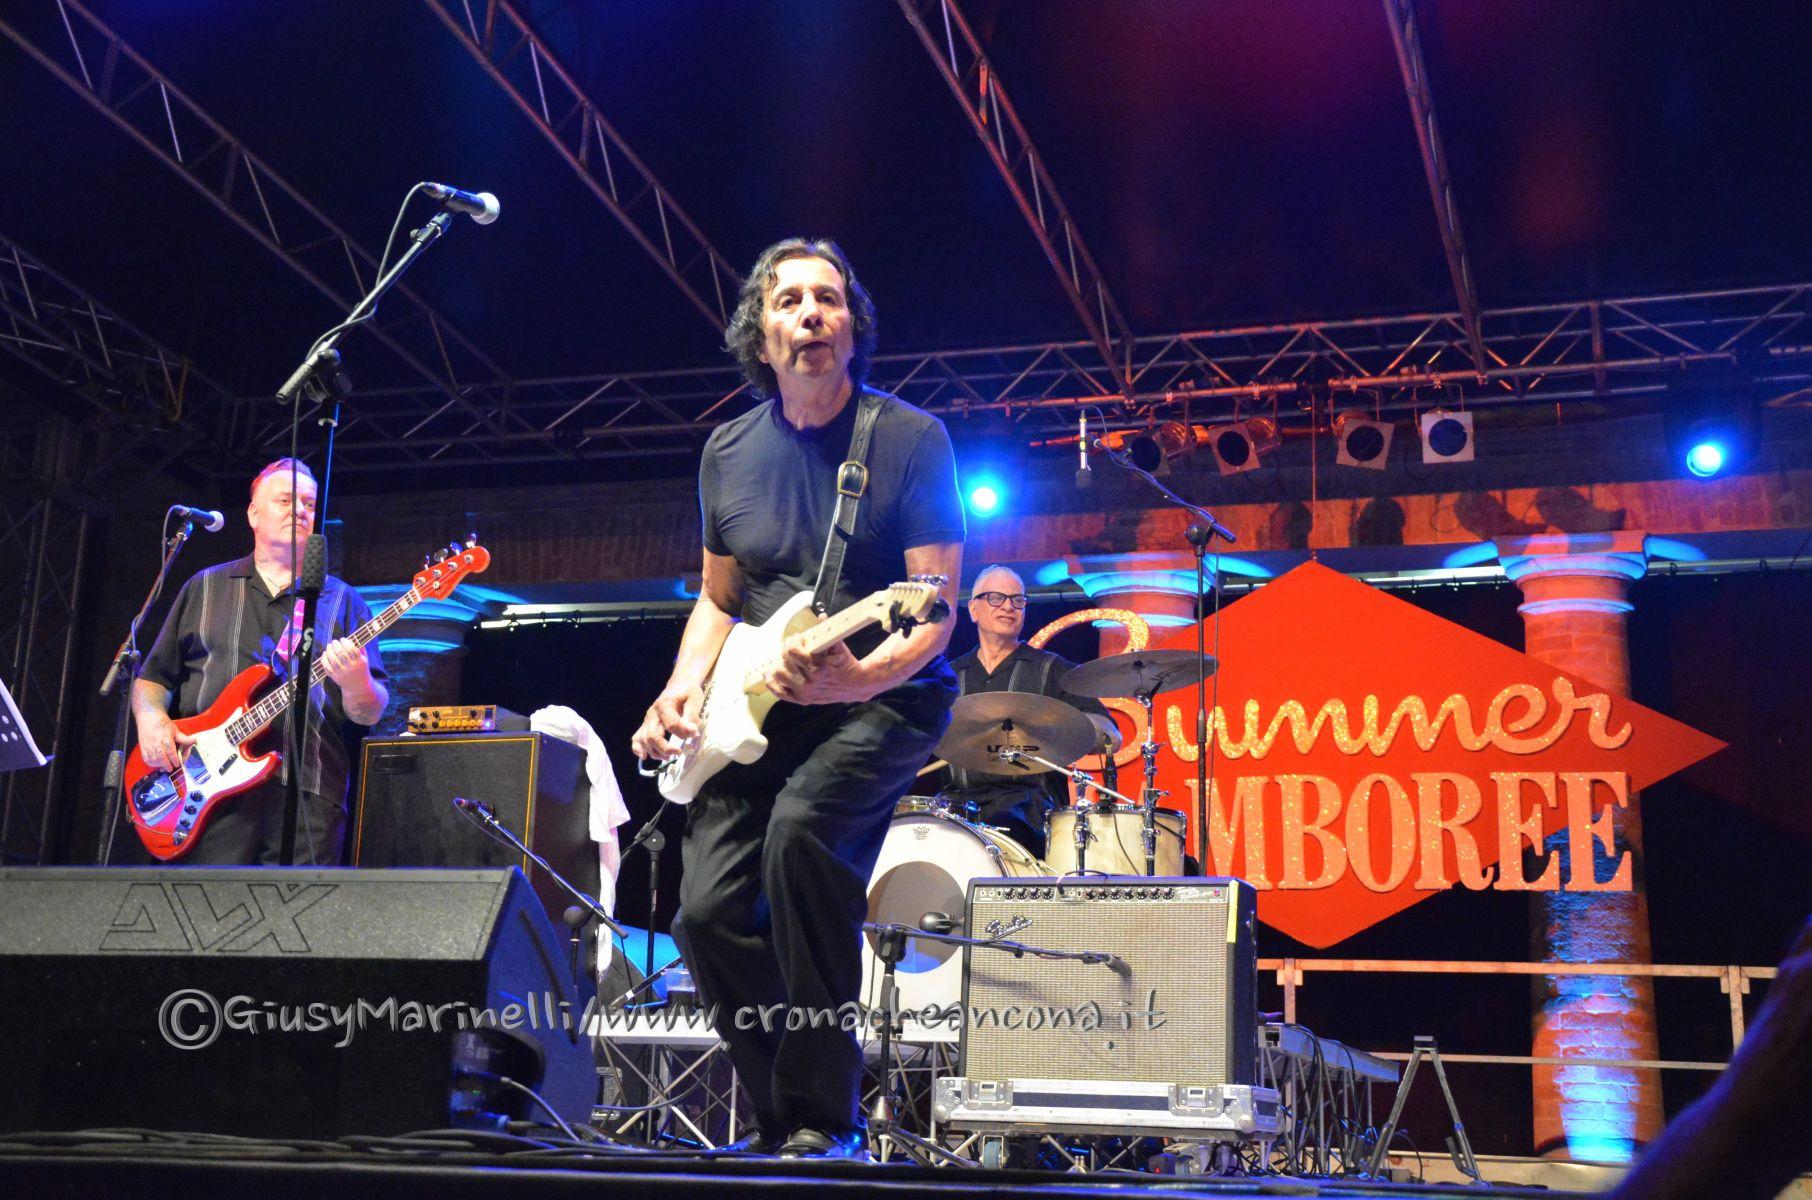 Summer_Jamboree-1-DSC_0321